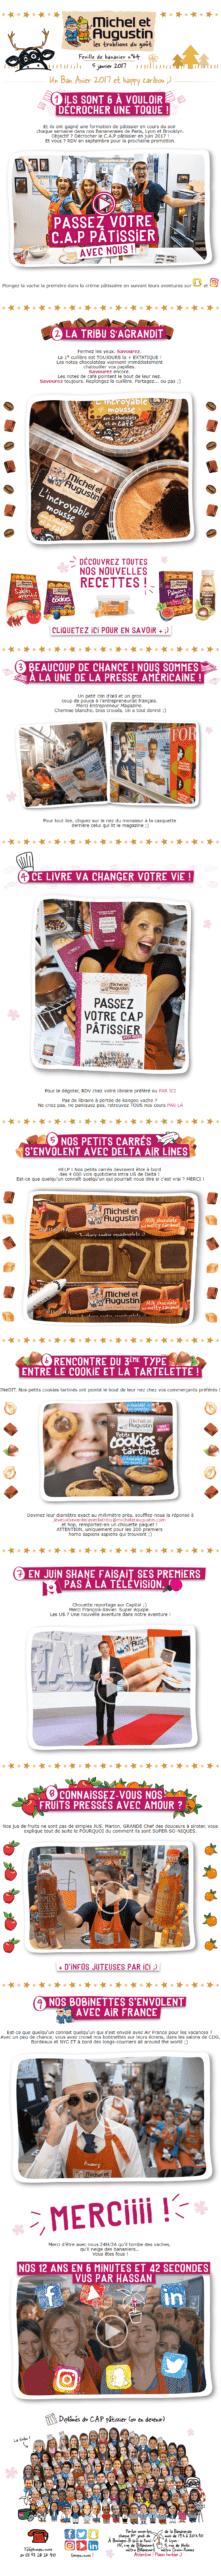 Exemple de newsletter #9 : Michel et Augustin